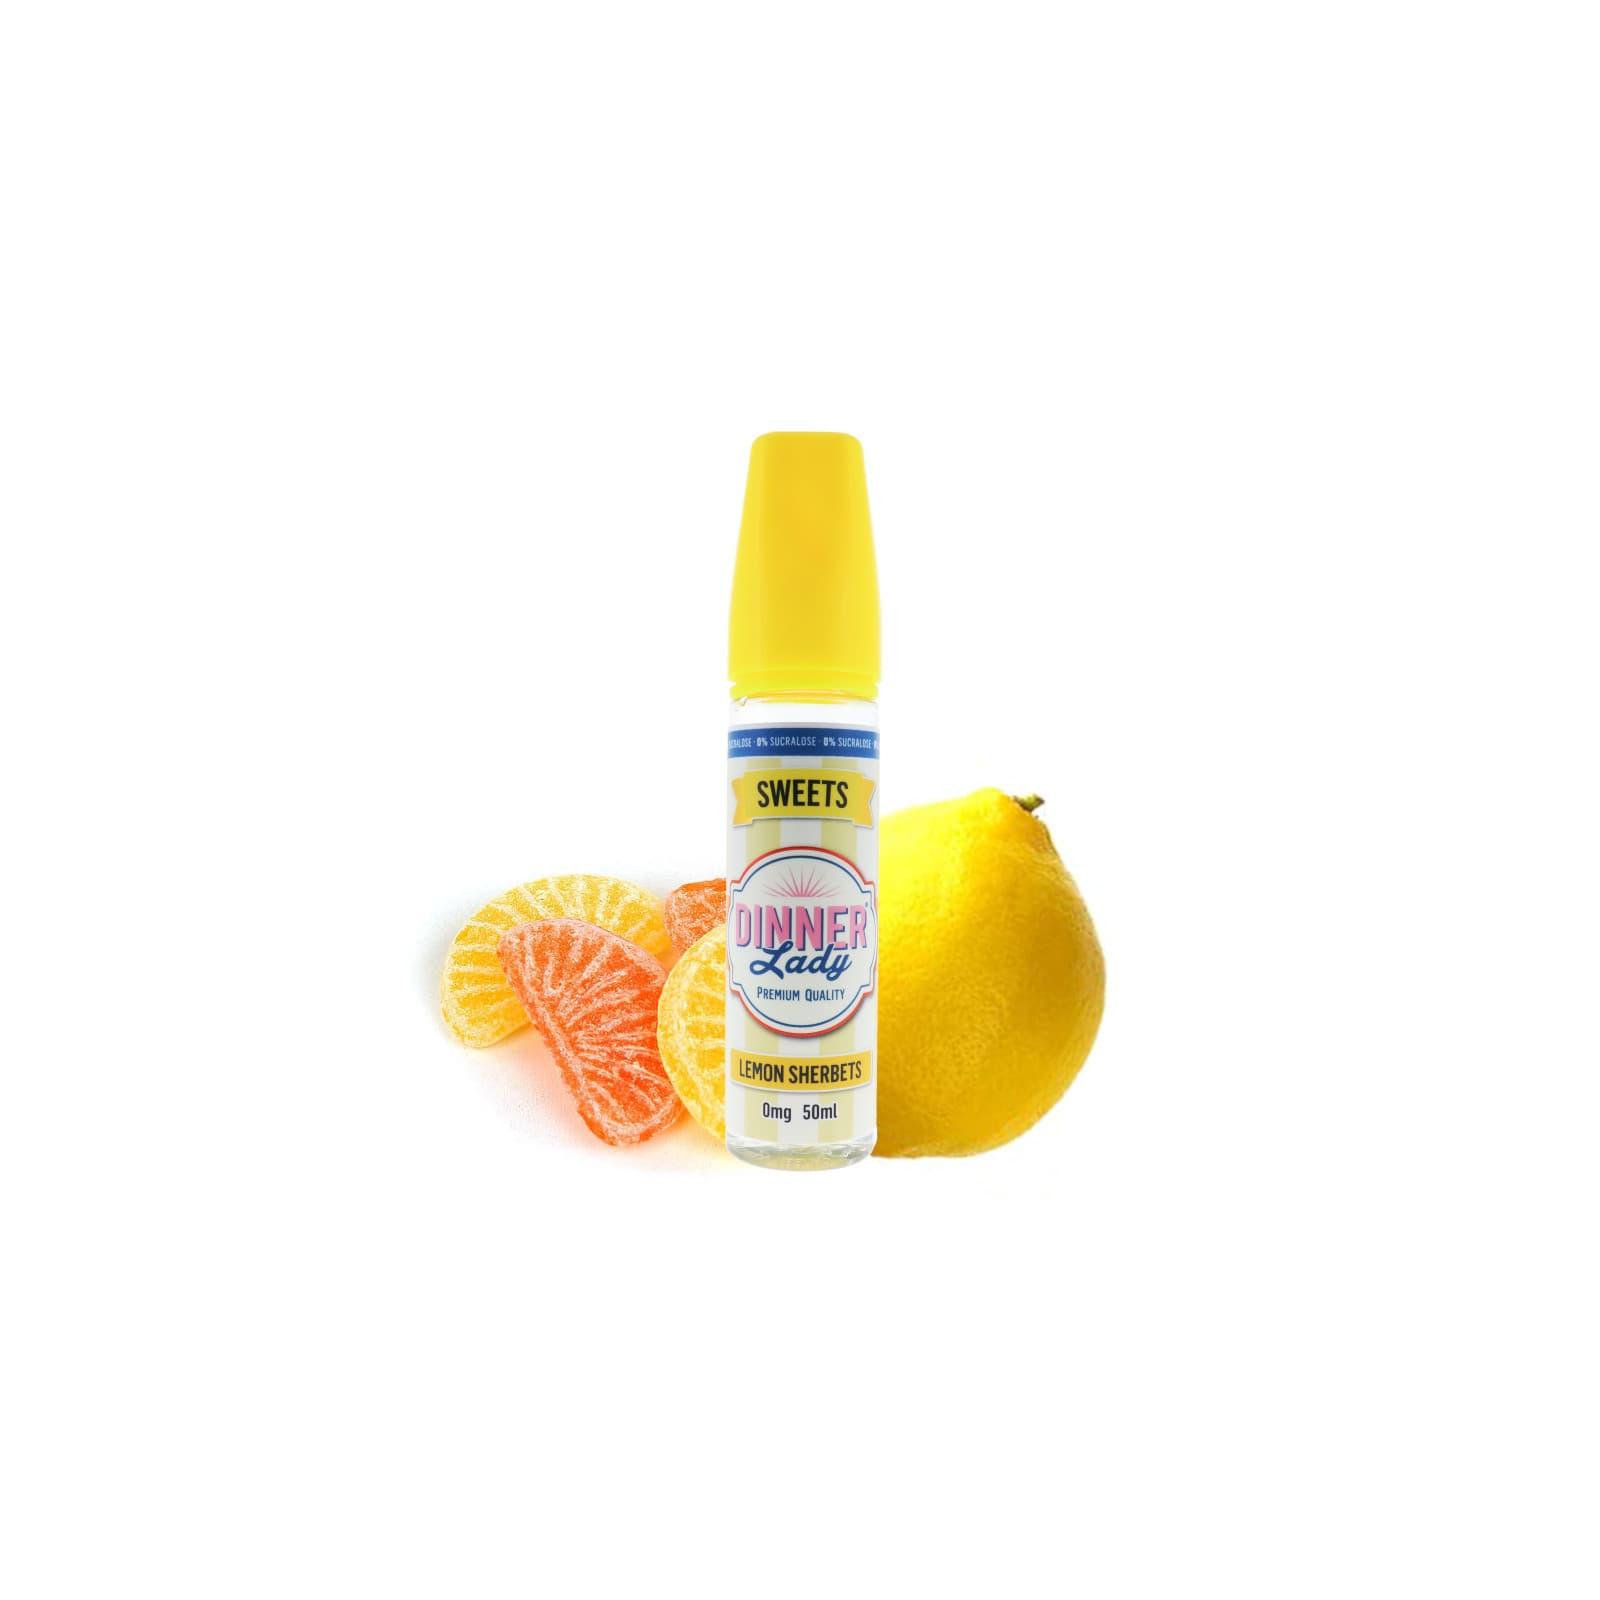 Lemon Sherbets 0% sucralose 50ml - Dinner Lady